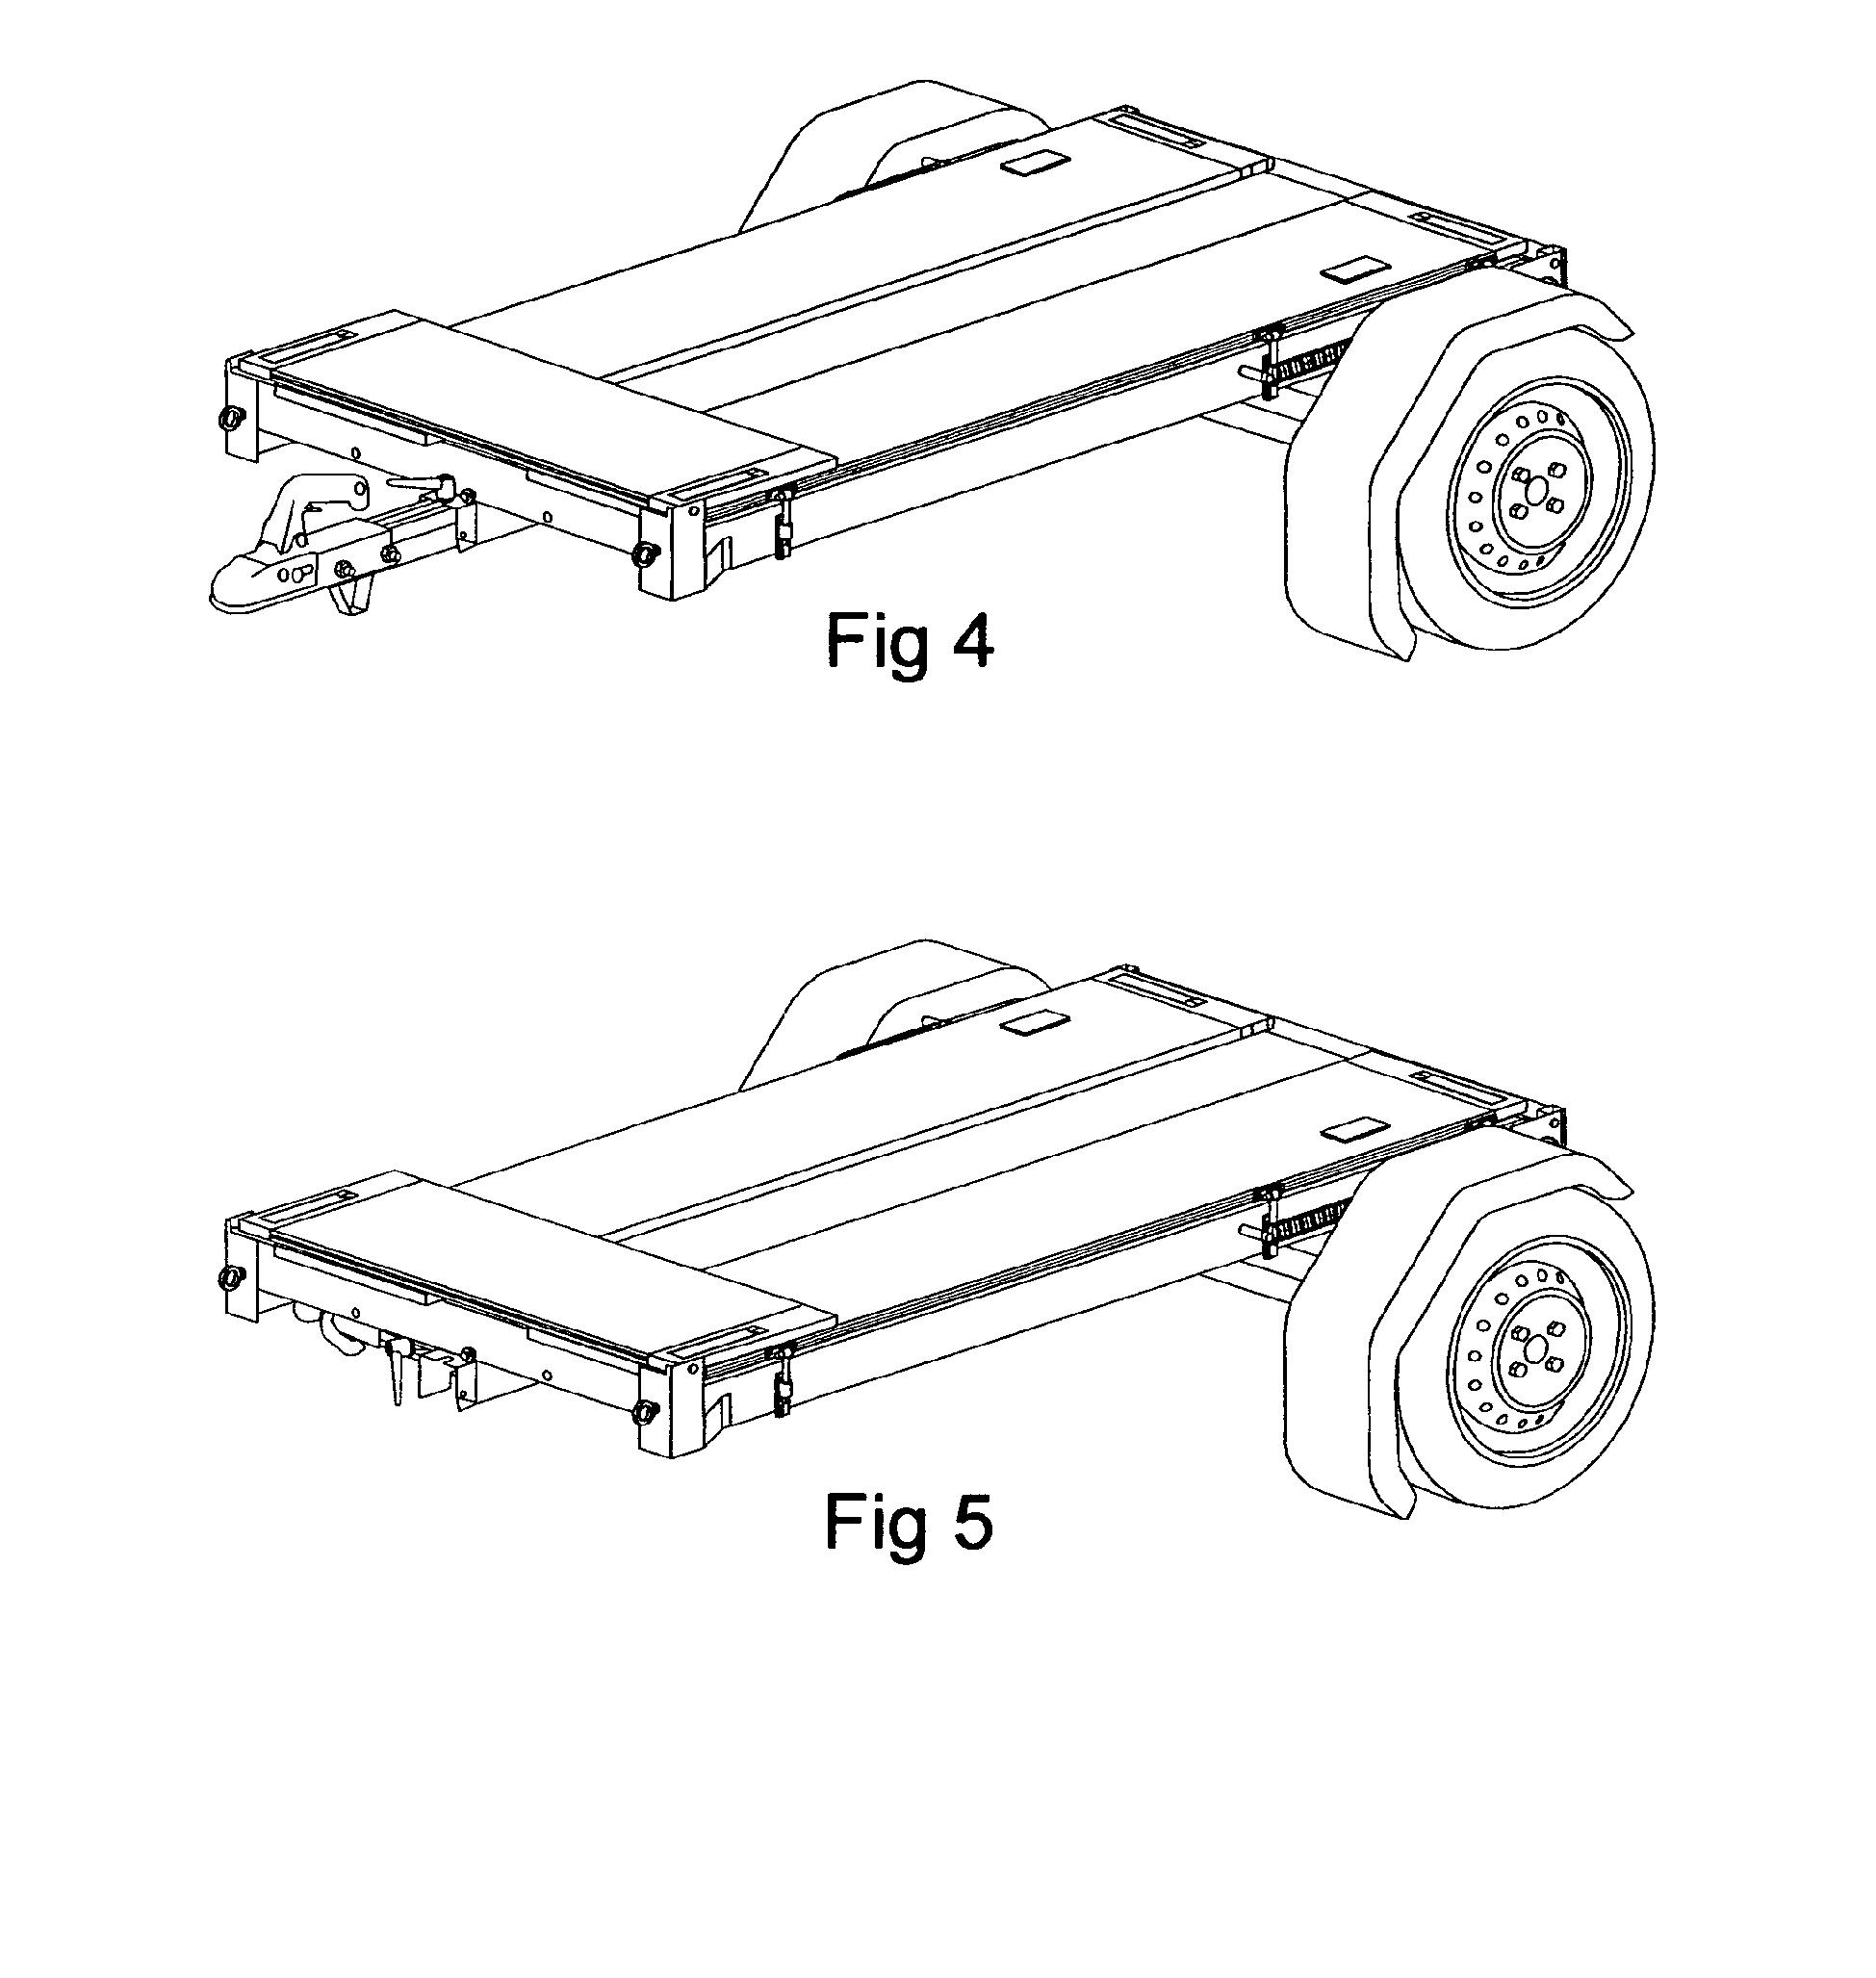 Patent Ep2524860a1 Klappbarer Anhnger Google Patents Mercruiser 470 Wiring Diagram Drawing